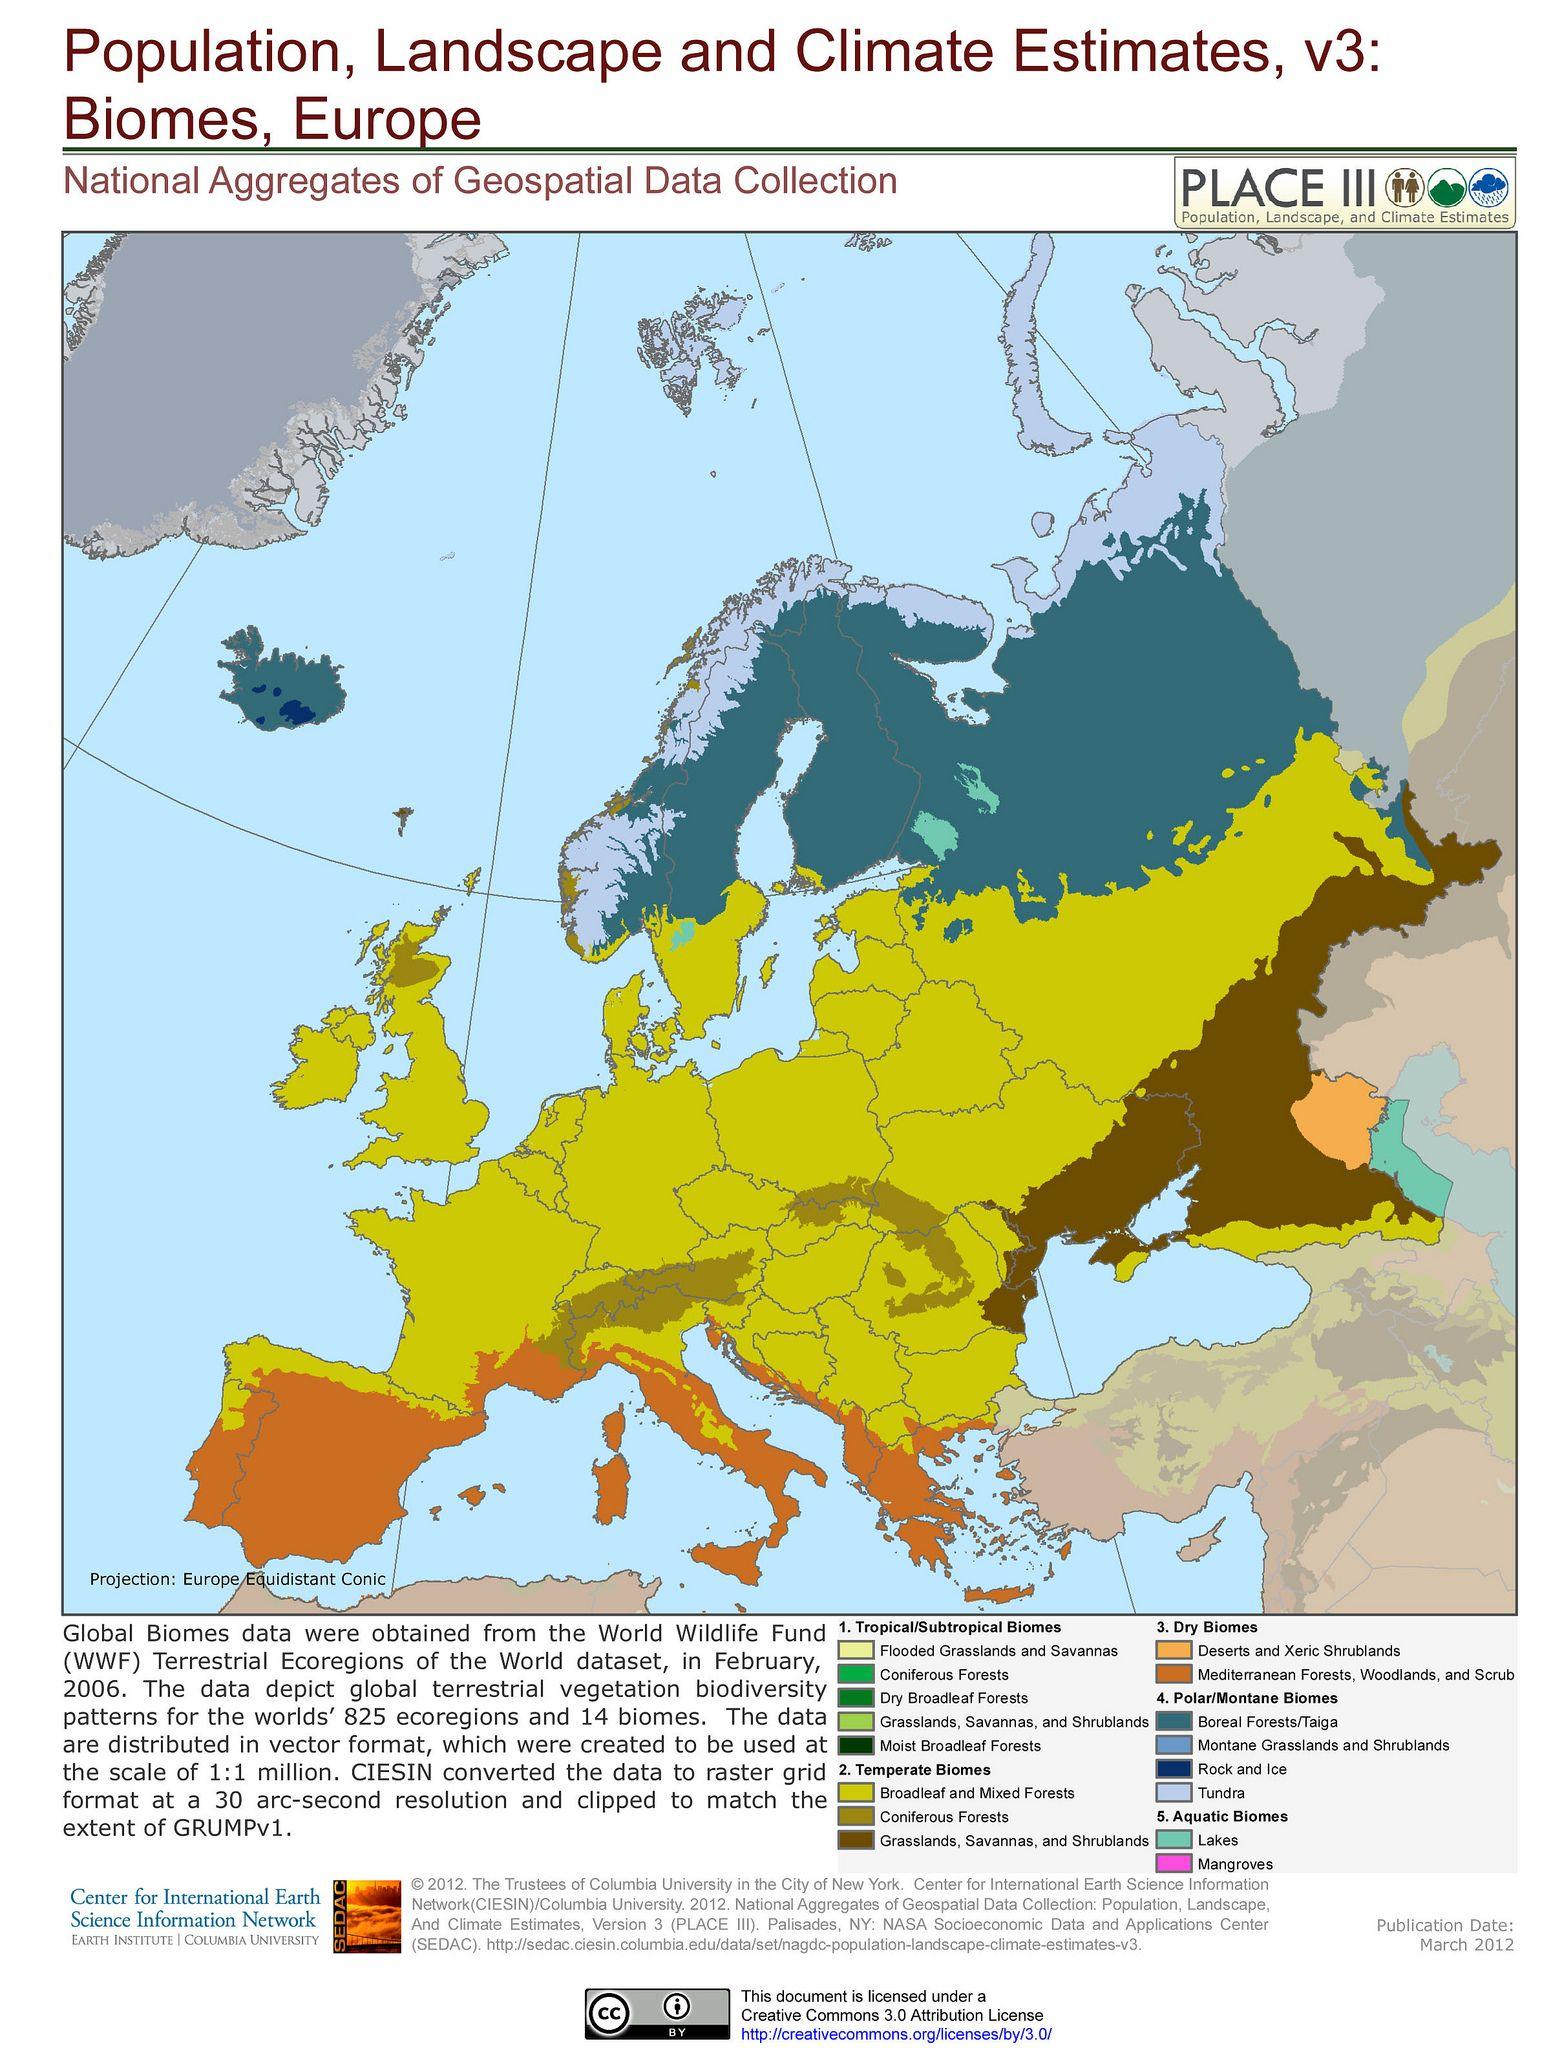 Biomes Europe